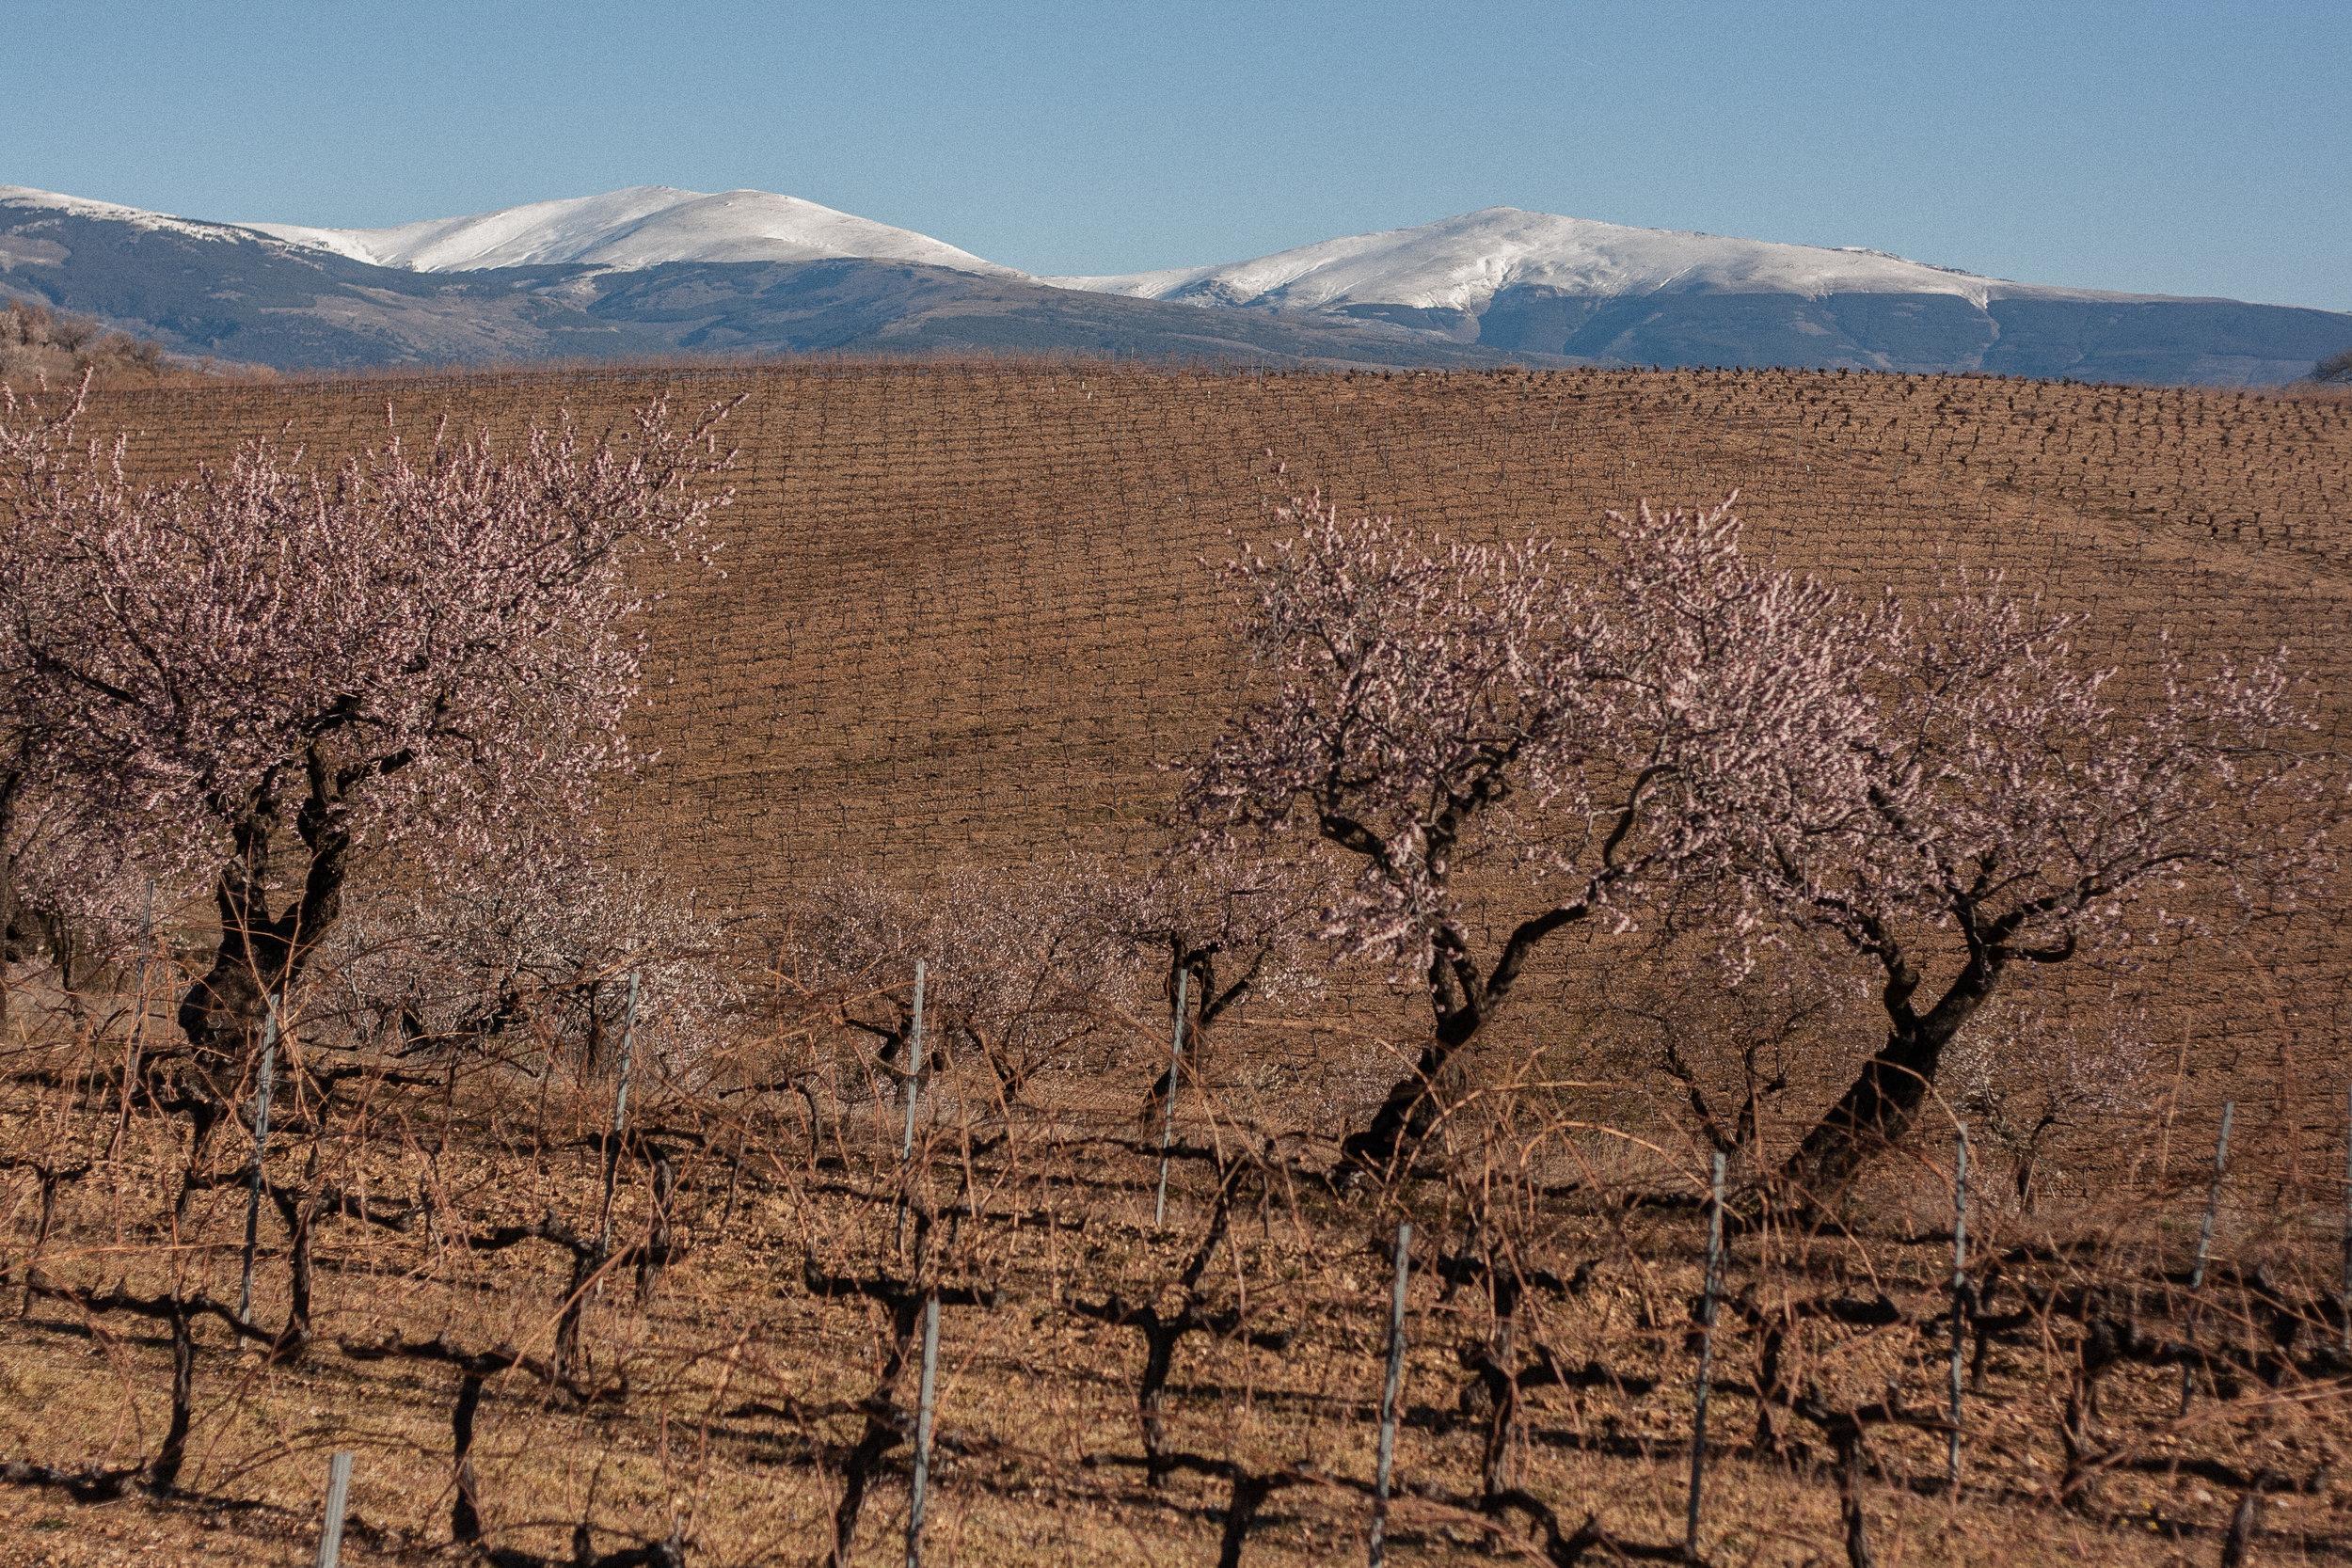 barranco-almondtrees-vines.jpg